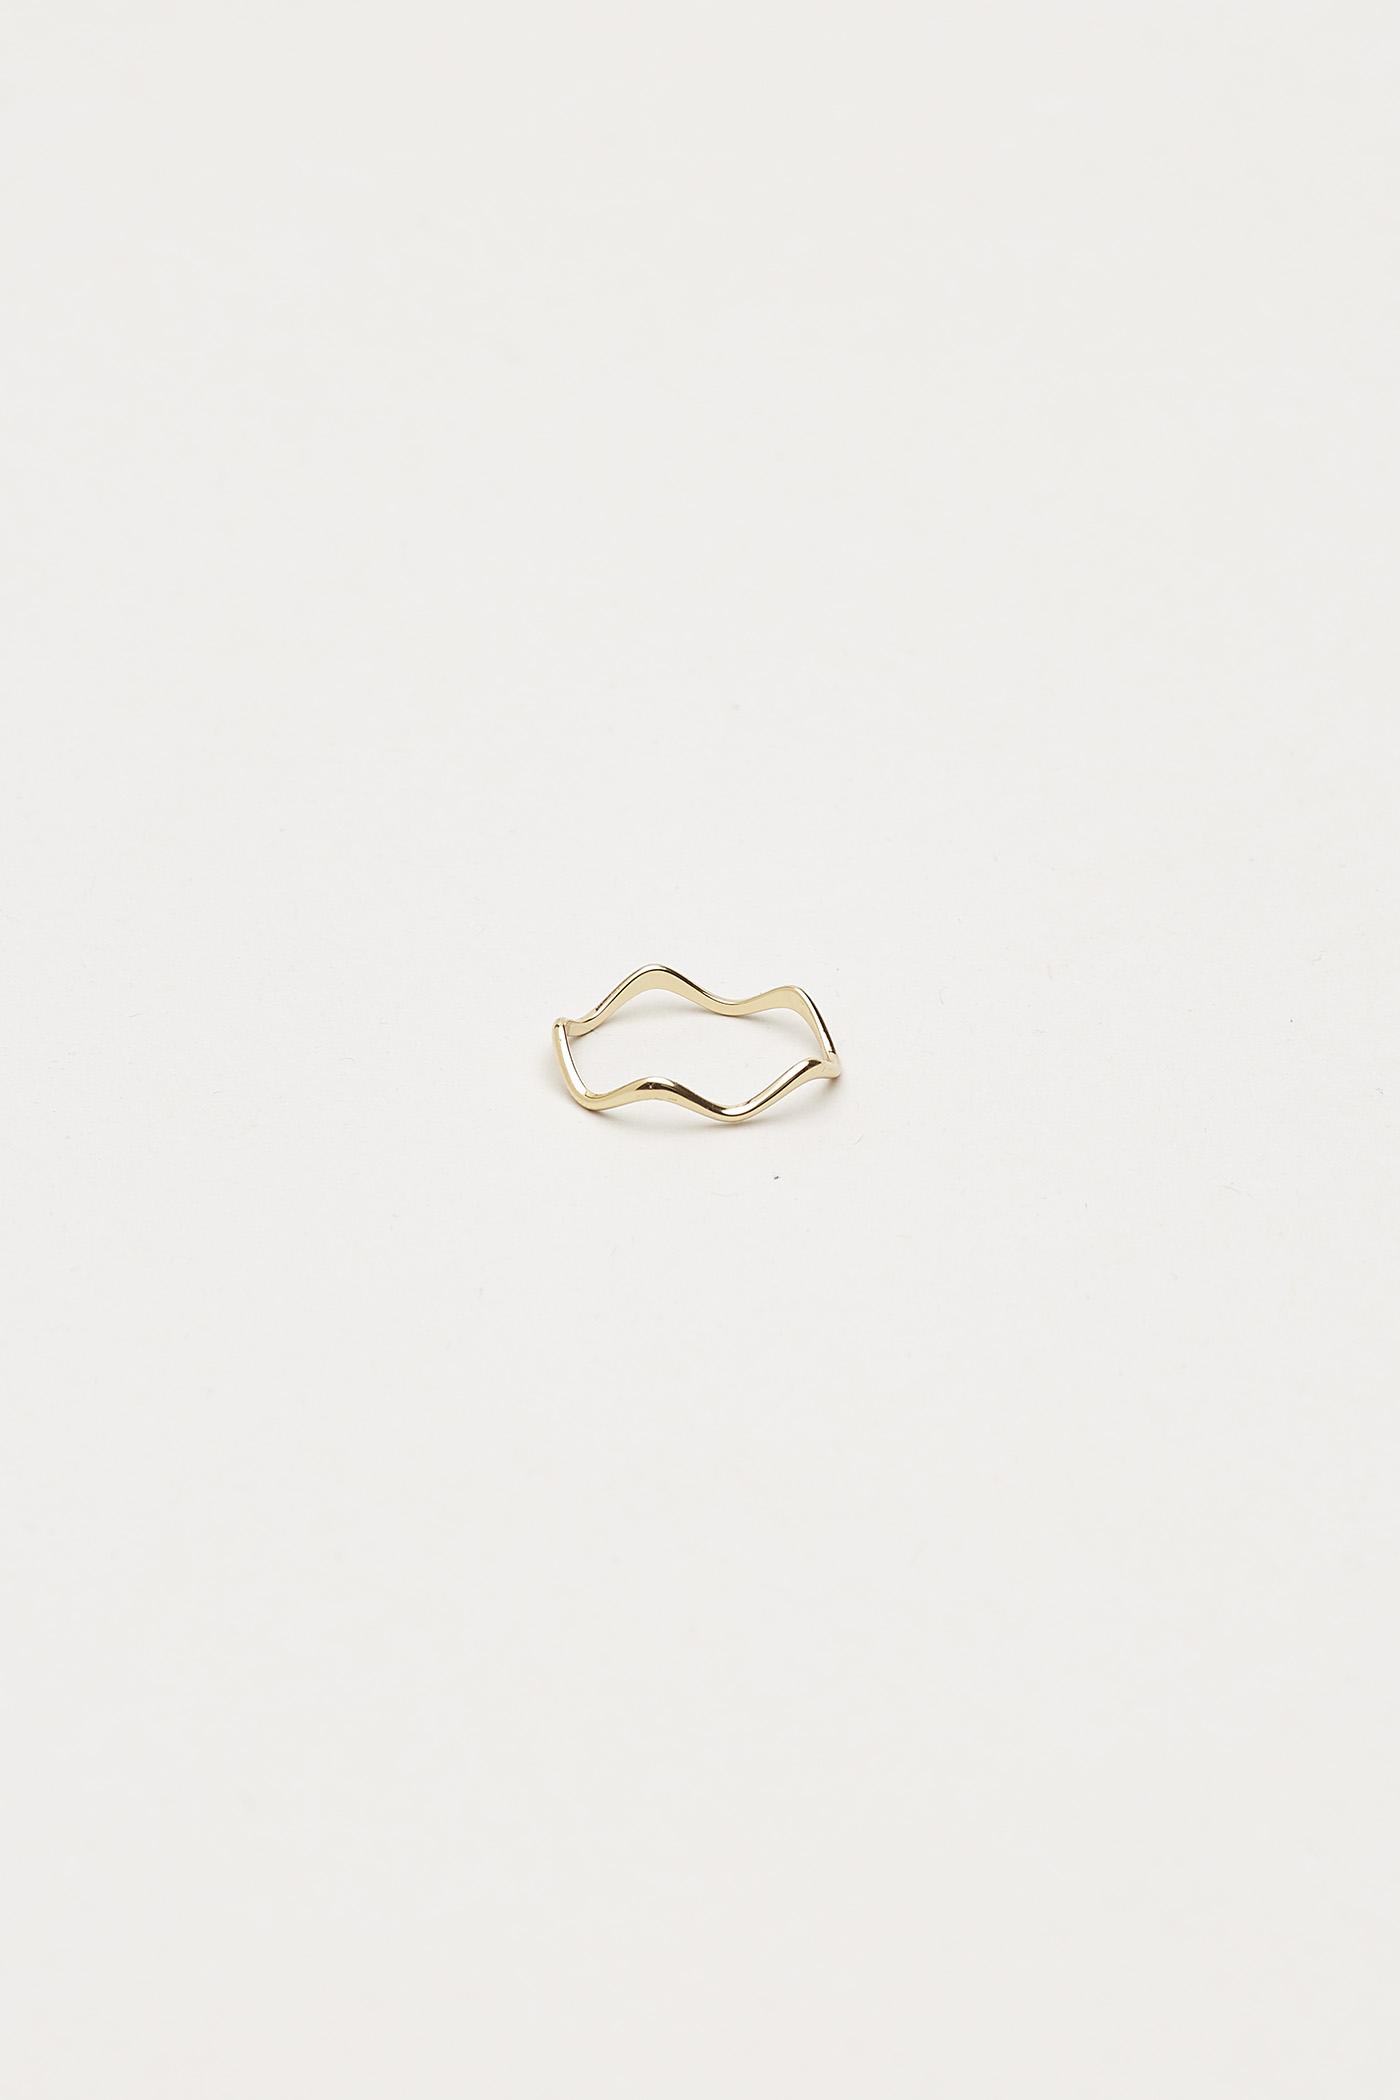 Seraphina Wave Ring